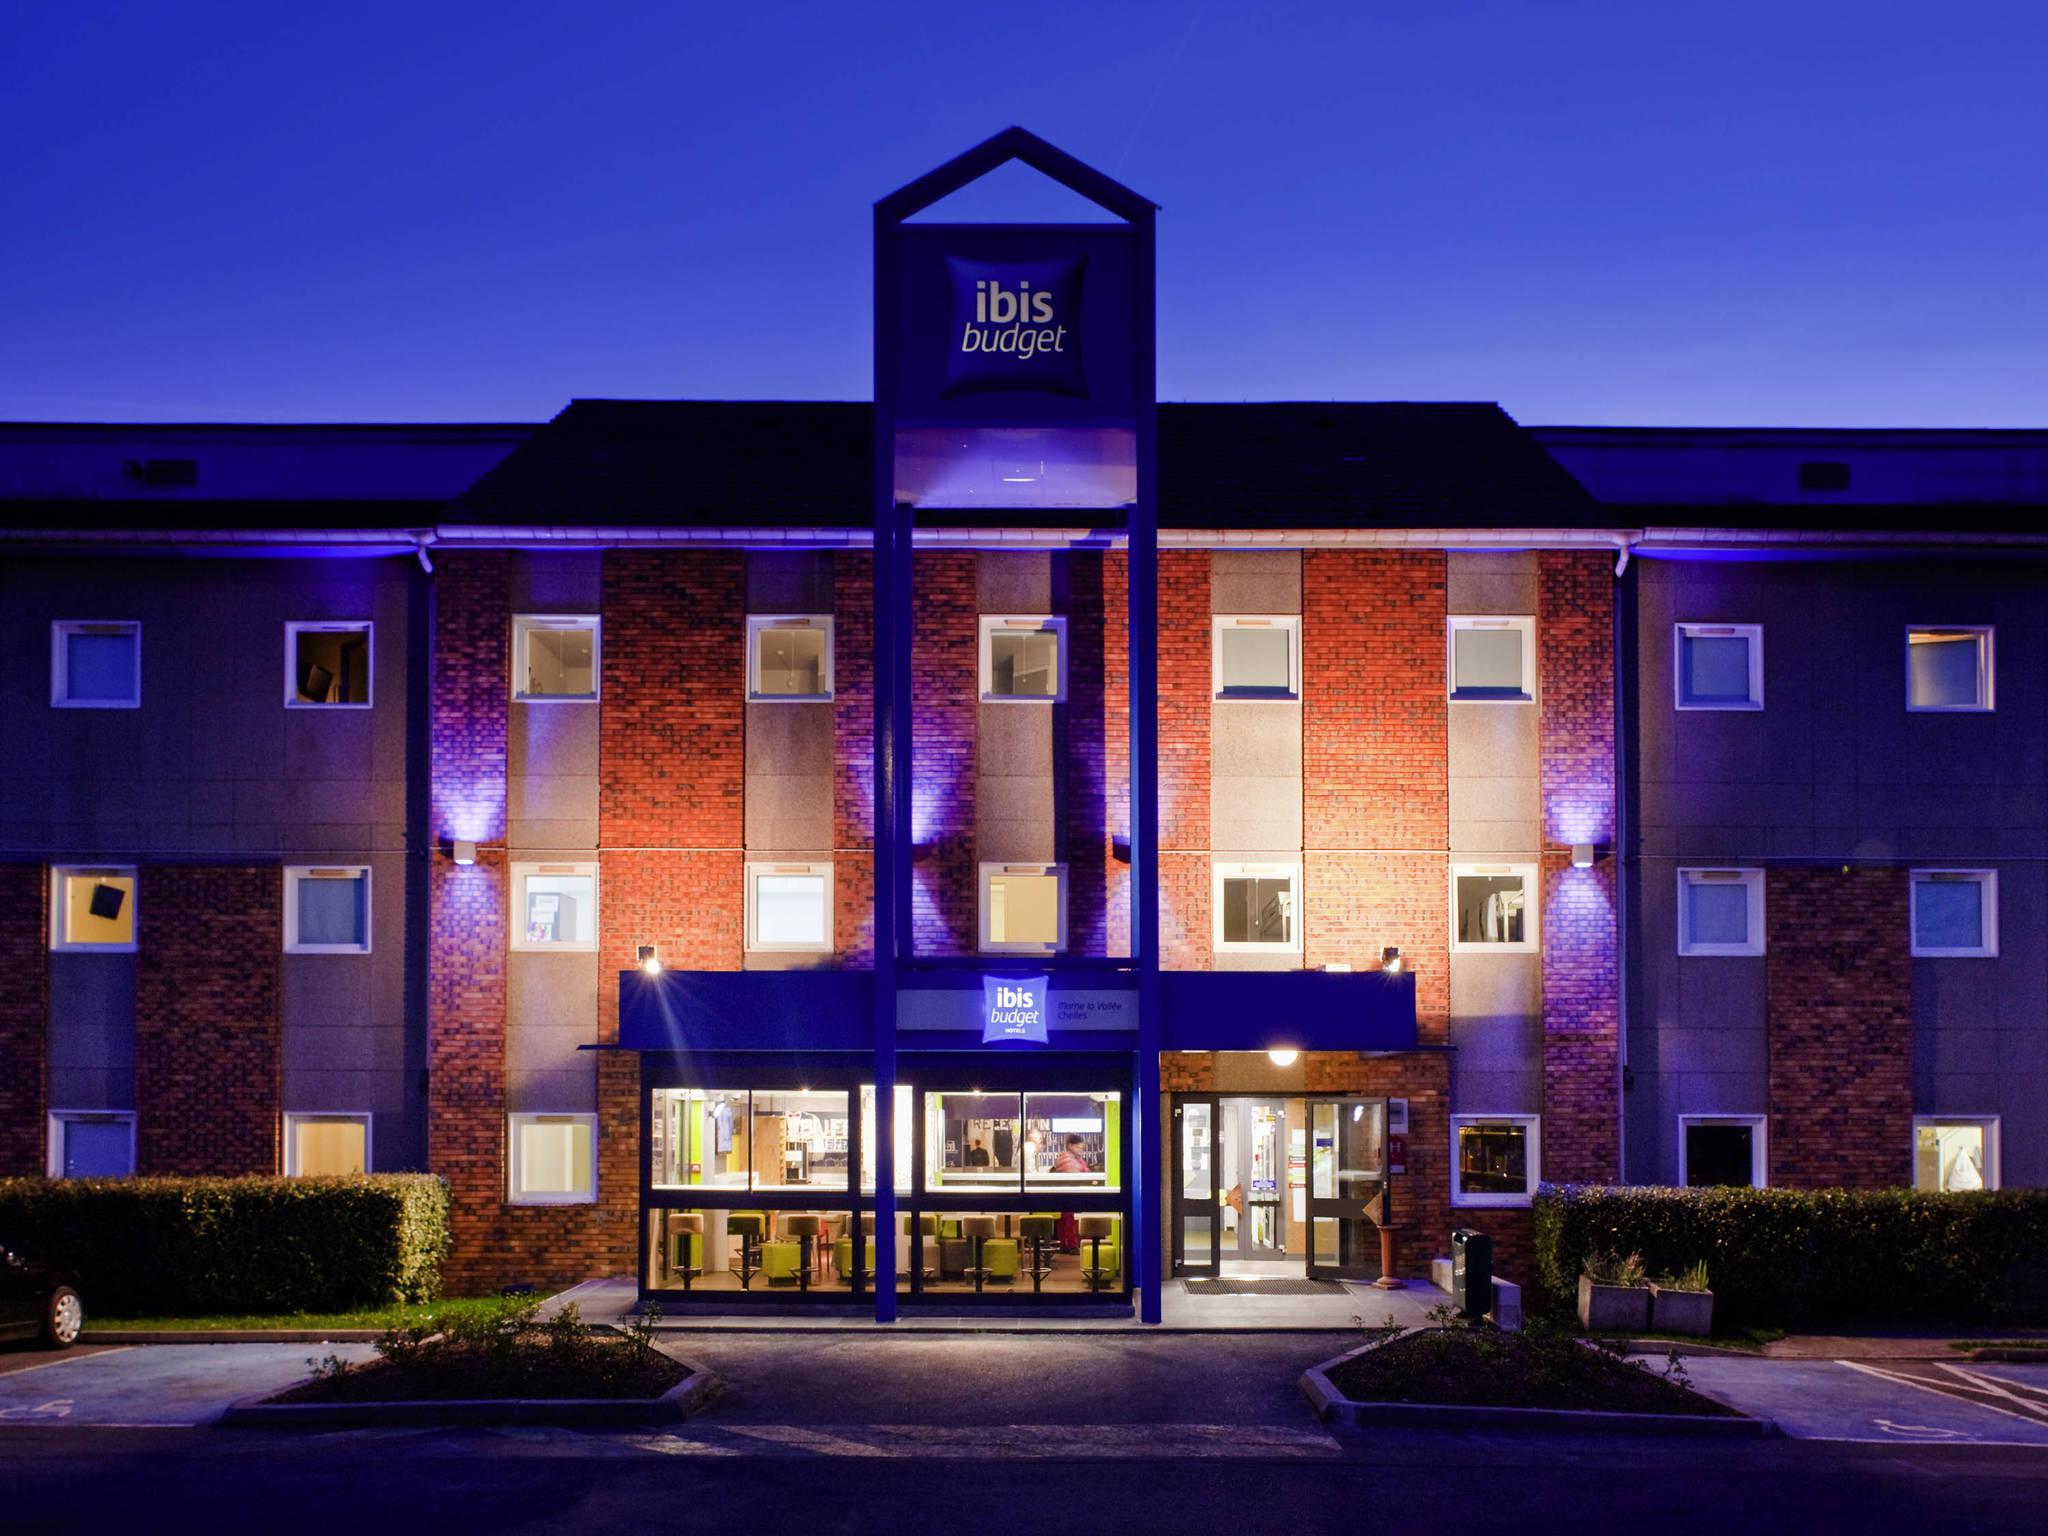 Hotel Ibis Budget Marne La Vallée Chelles